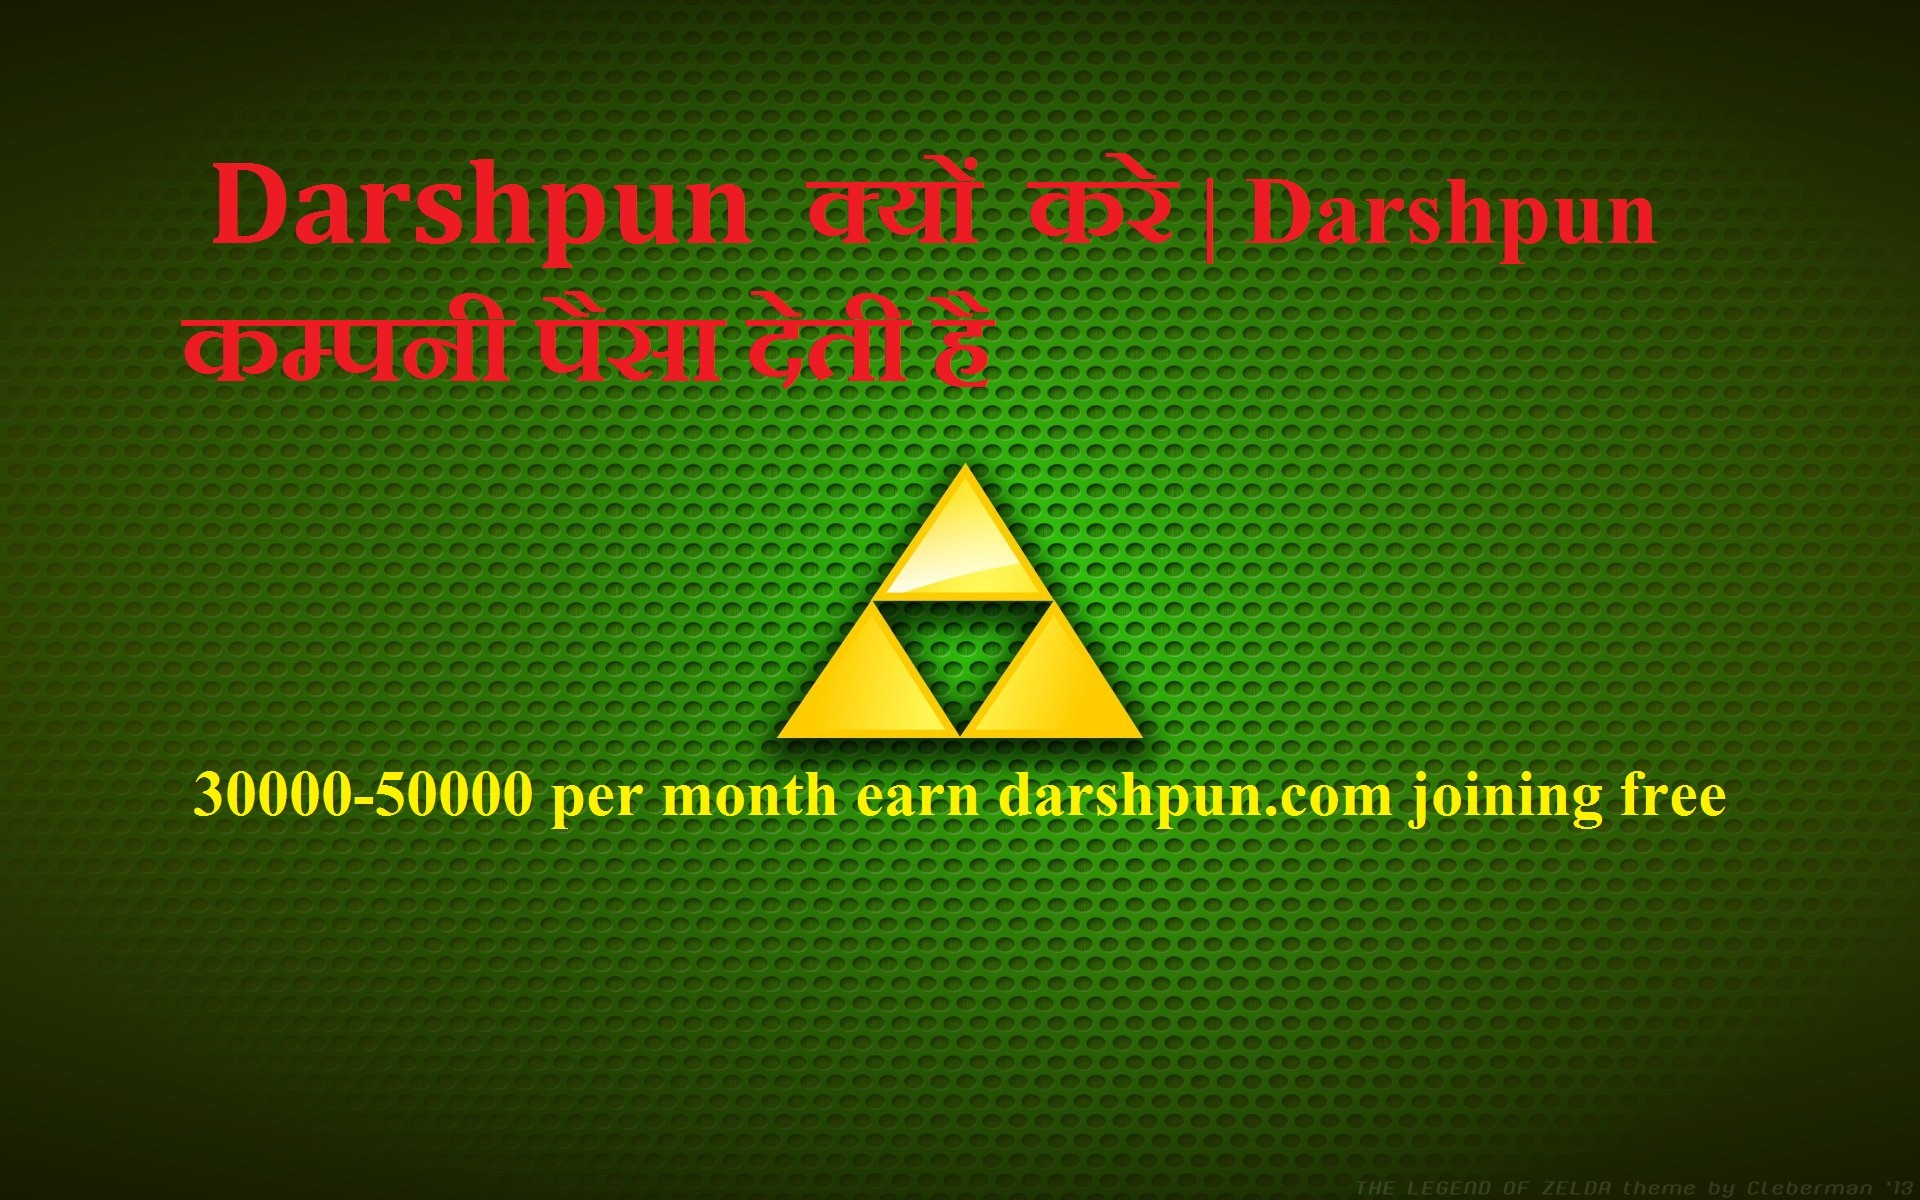 Darshpun Ultraplus Digitech Pvt. Ltd-Darshpun कया है   Darshpun क्यों करे    Darshpun कम्पनी पैसा देती है